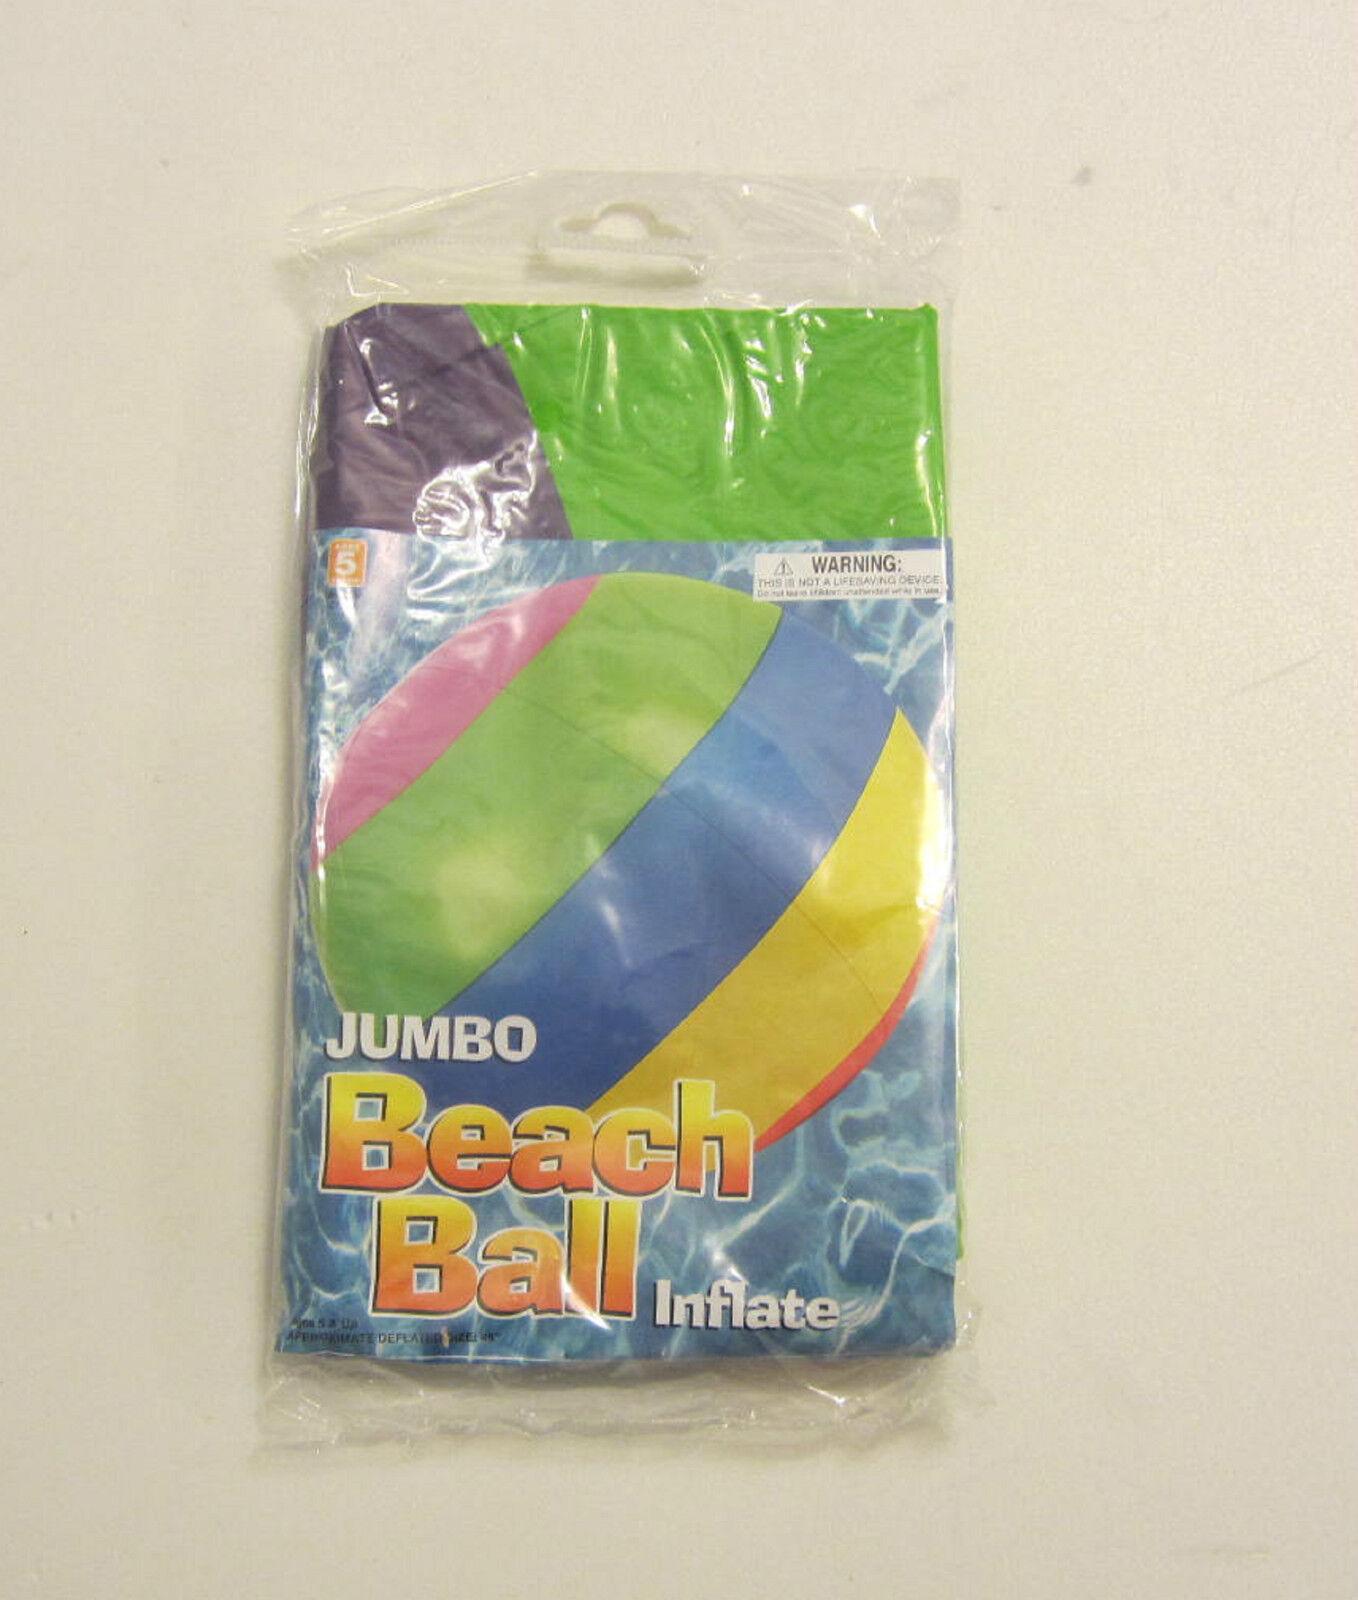 6 NEW JUMBO 48  INFLATABLE MULTI colorD GIANT BEACH BEACH BEACH BALLS POOL PARTY BEACHBALL b66112